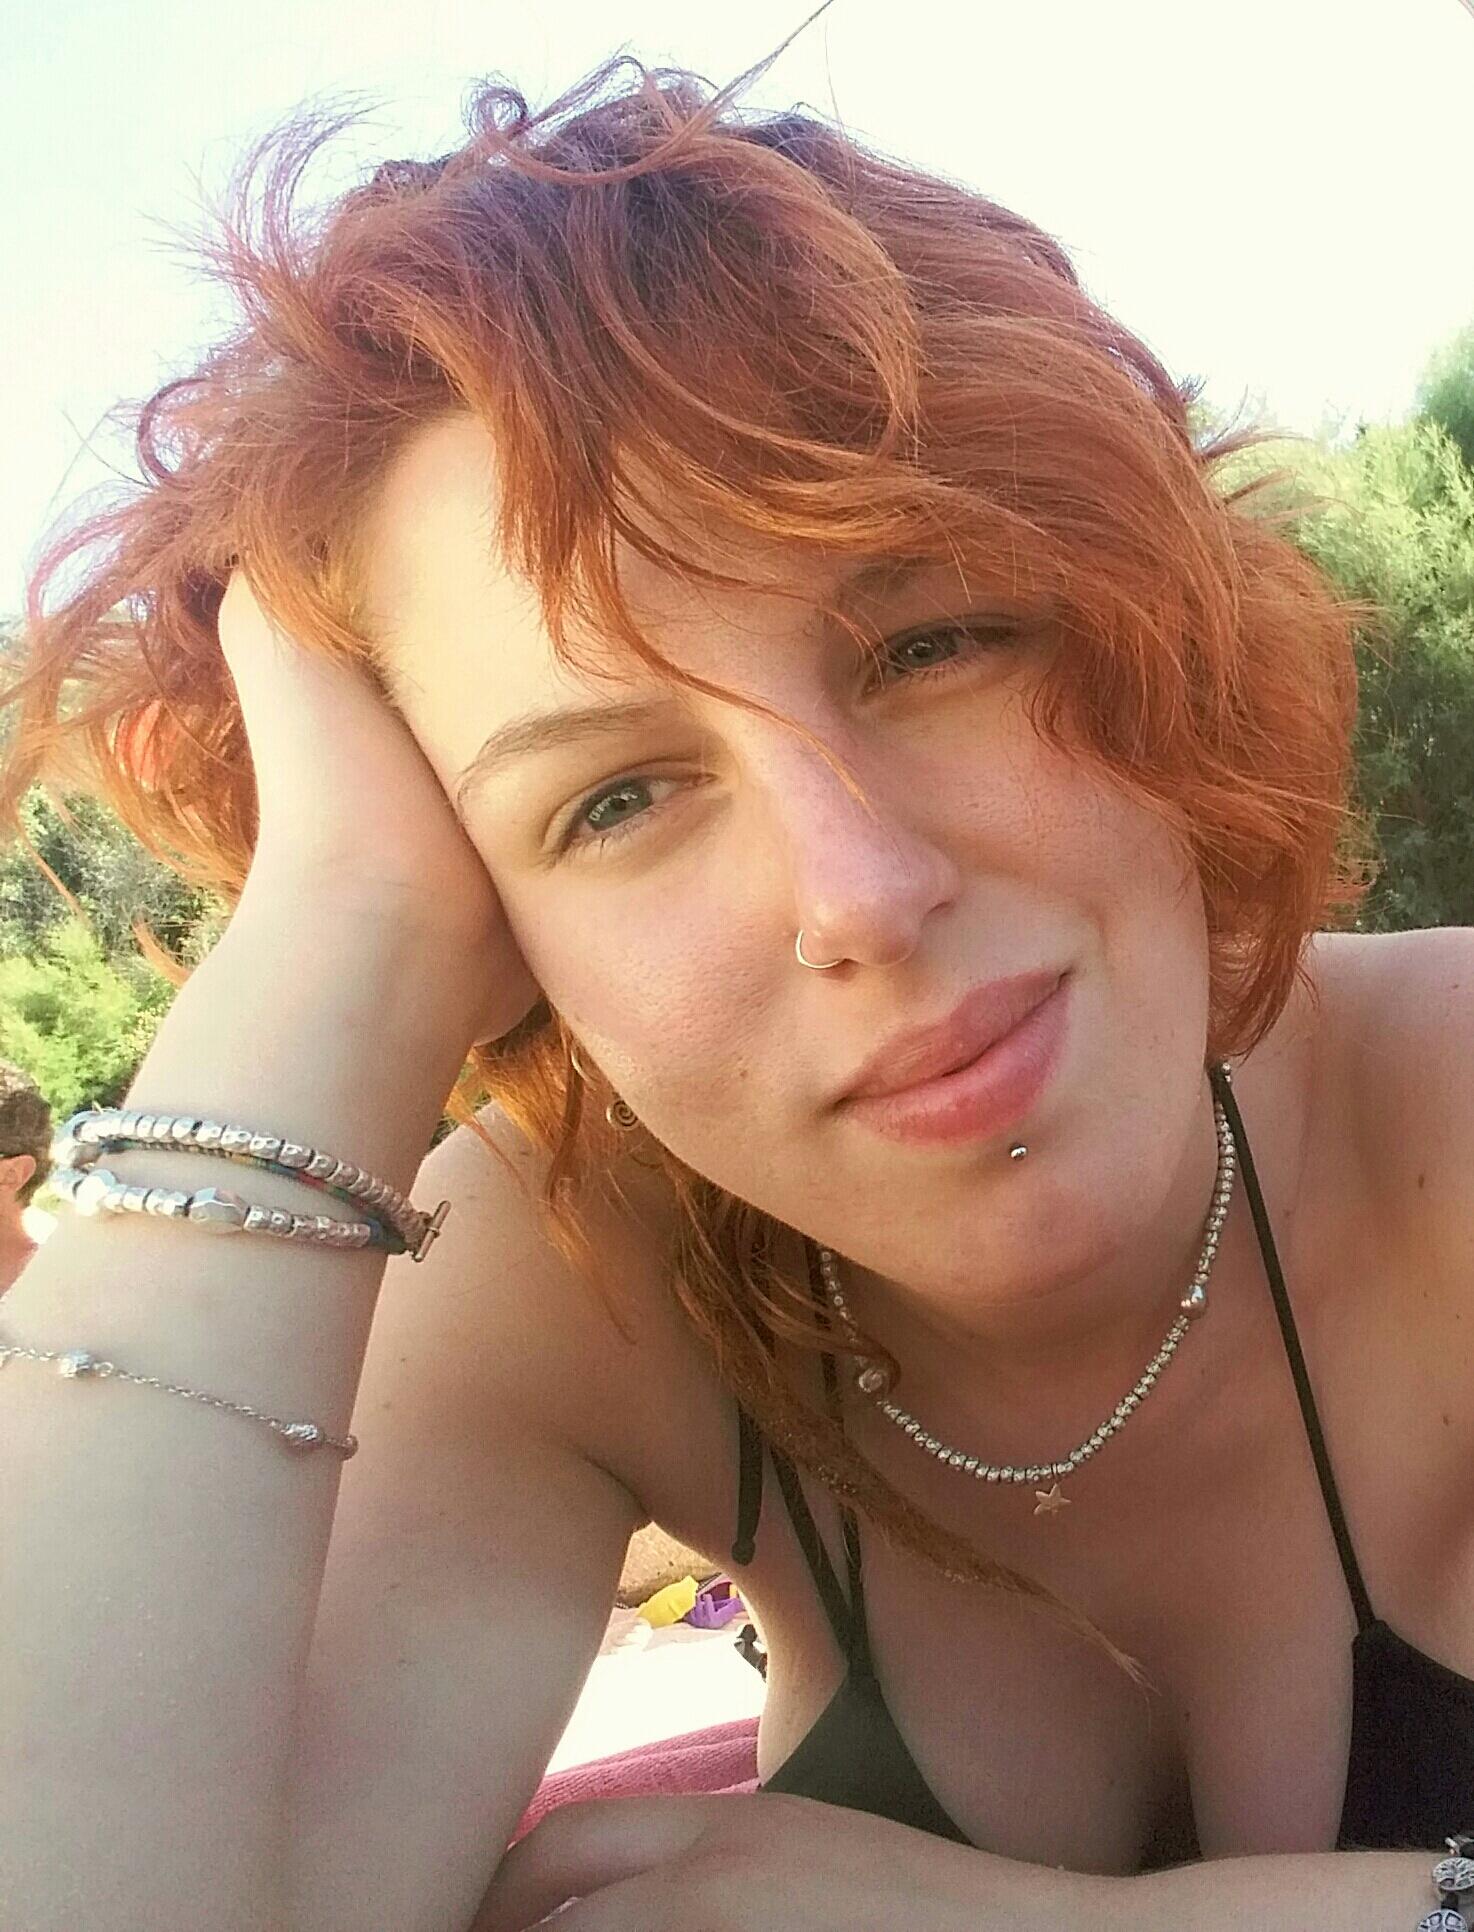 Valentina Terracciano